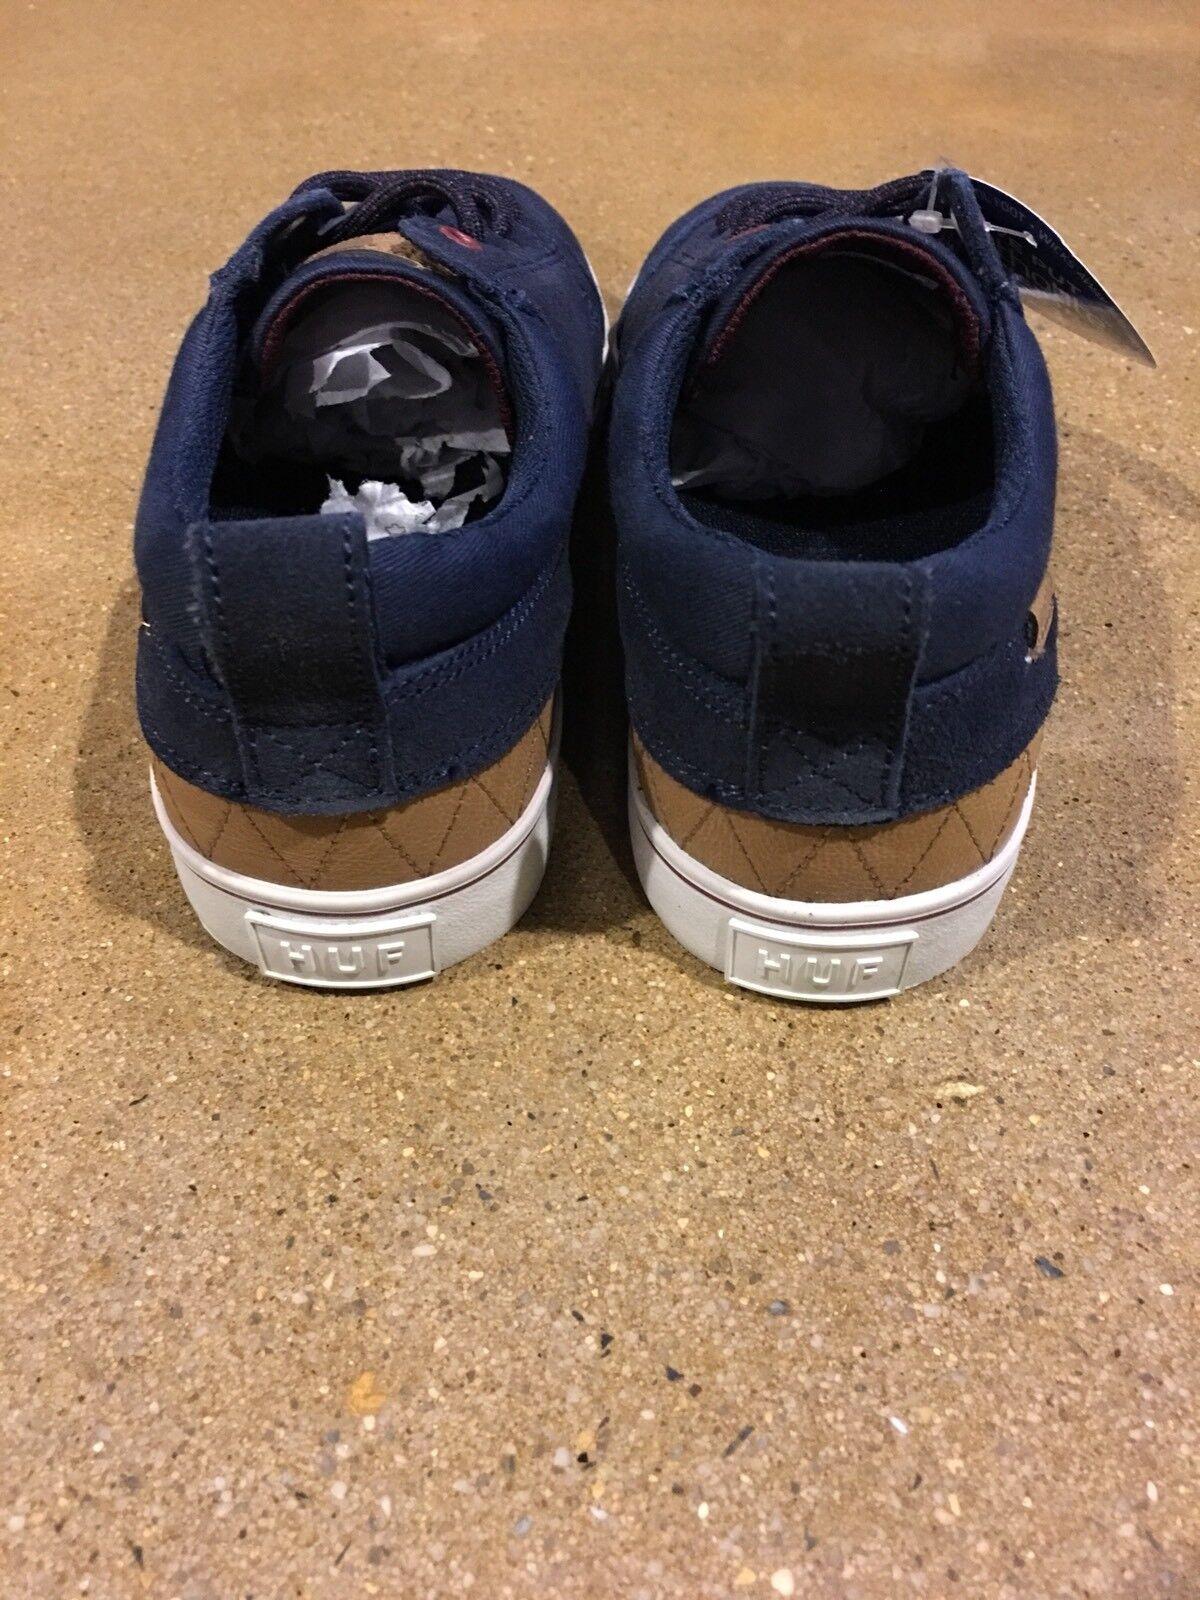 Huf Navy Ramondetta Größe 6 US Navy Huf Wine Peter Ramondetta Styling Skate Schuhes Sneakers 2b1bc2